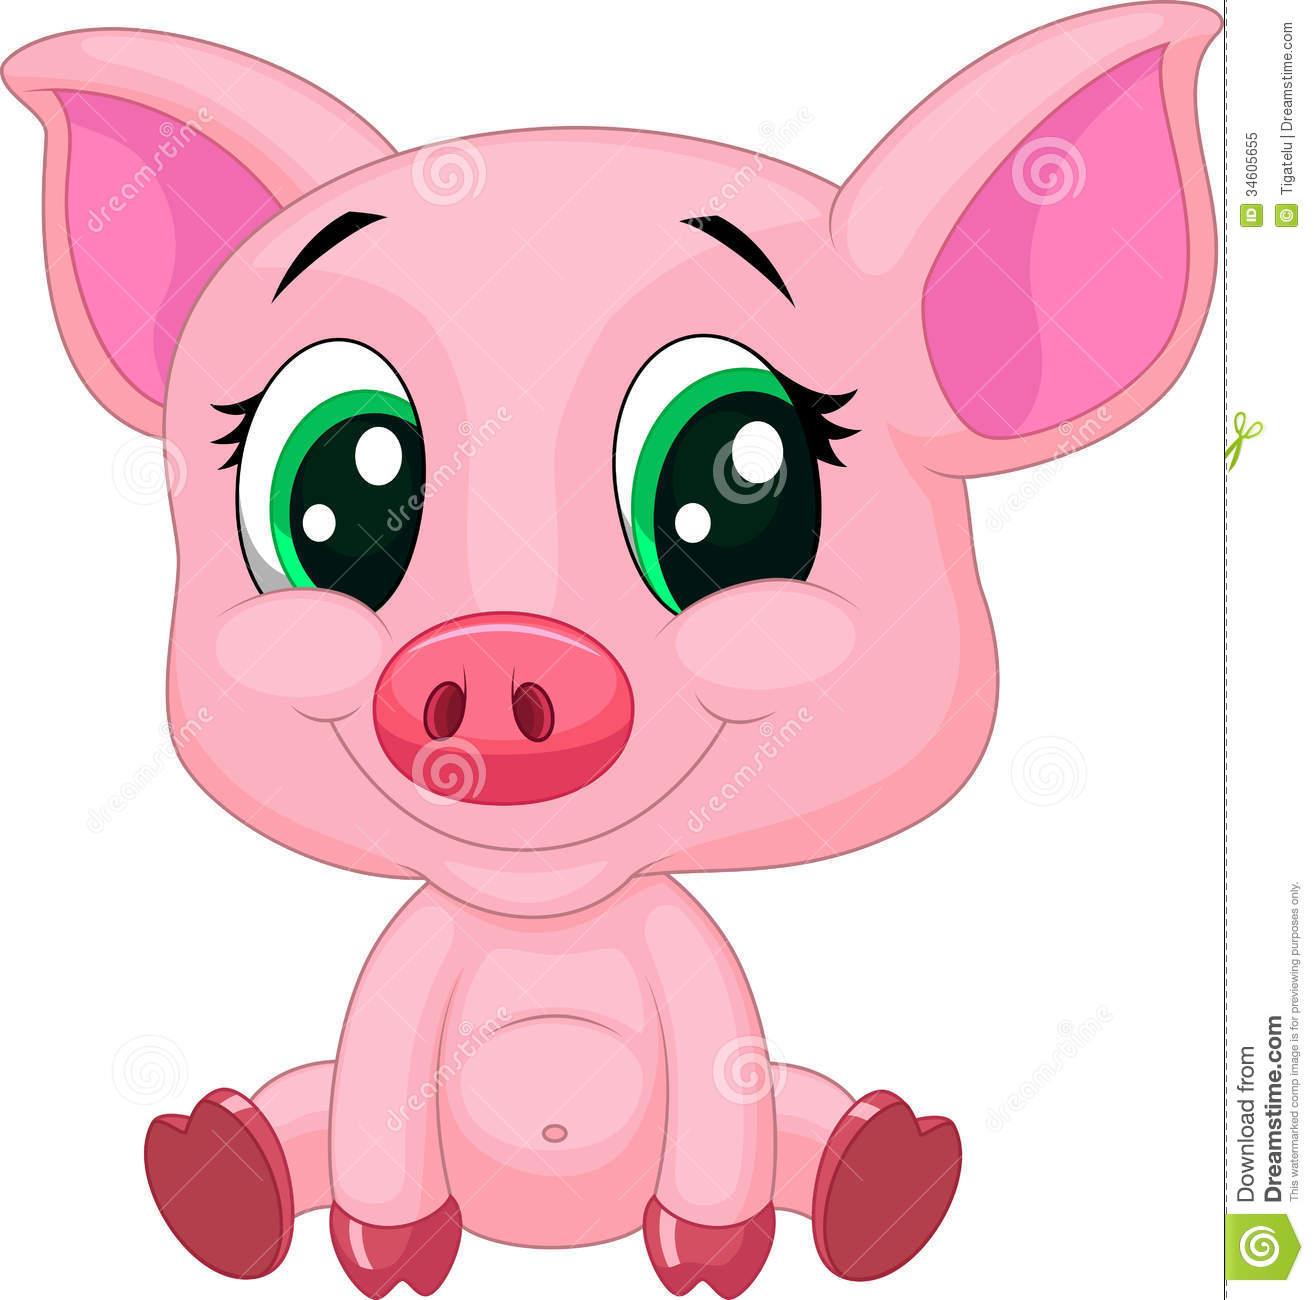 Cute Baby Pig Cartoon Stock Vector  Illustration Of Drawing